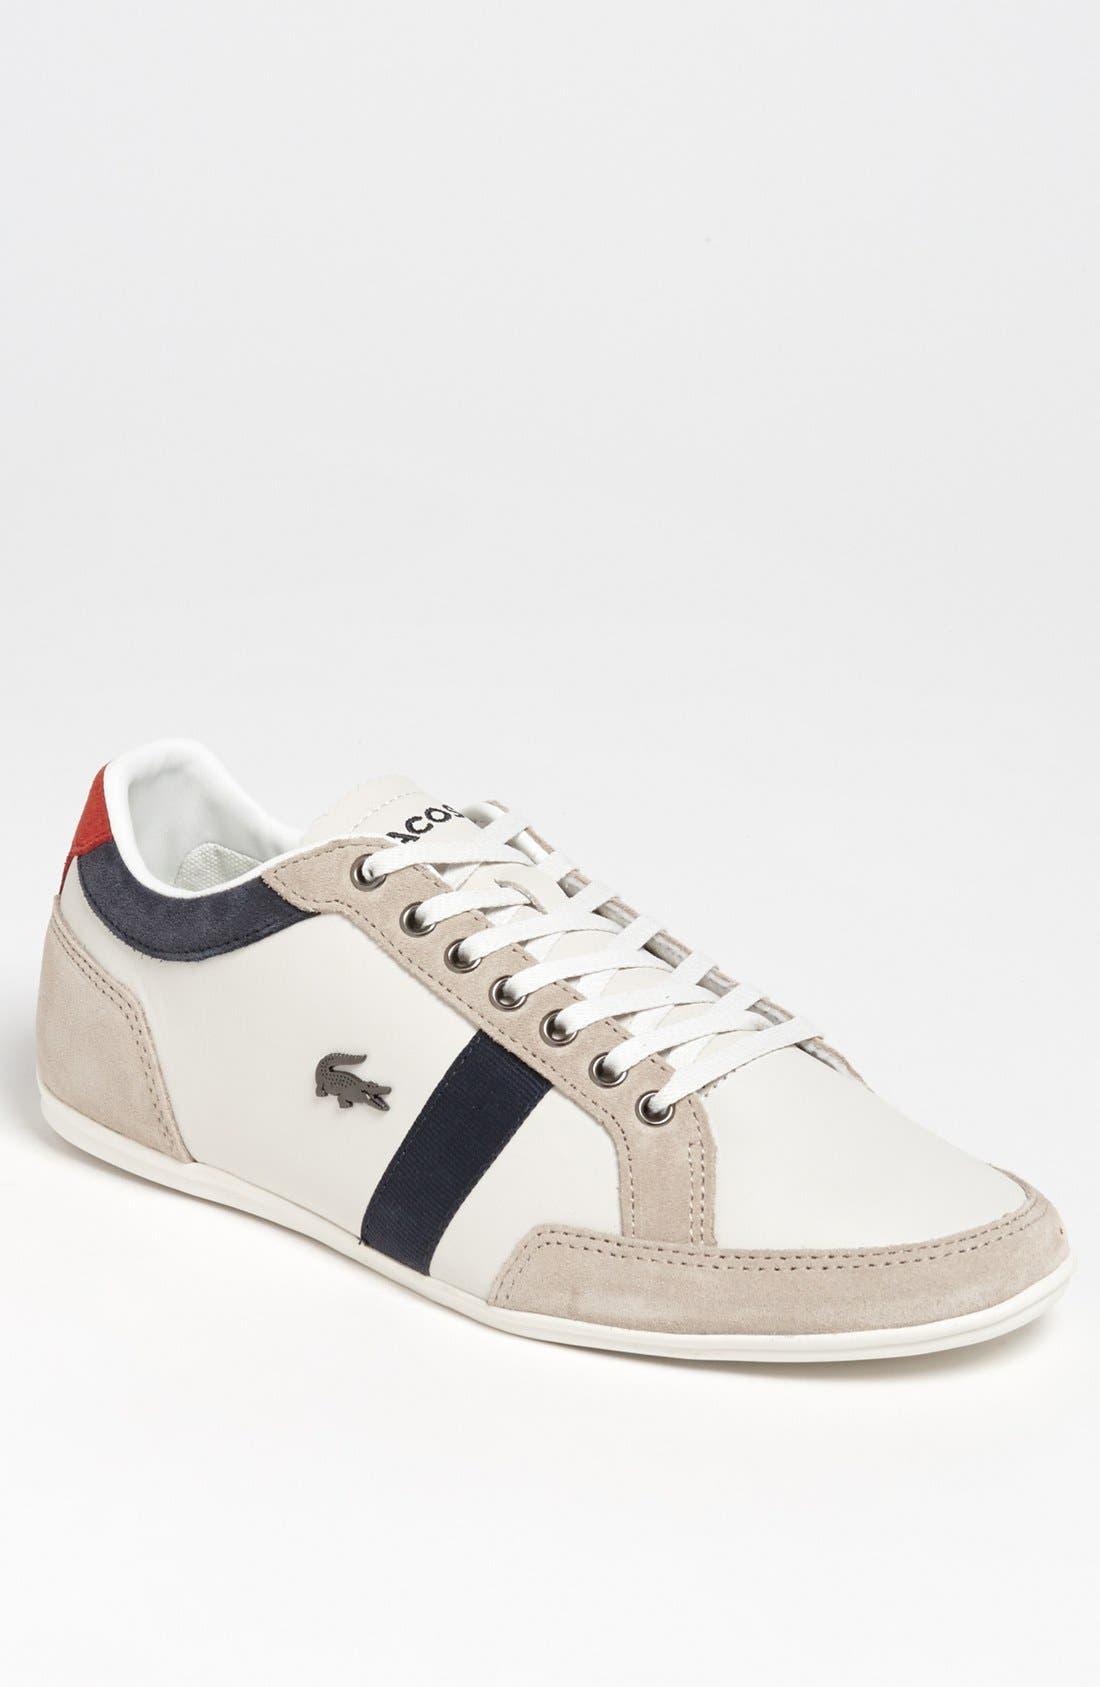 Main Image - Lacoste 'Alisos 8' Sneaker